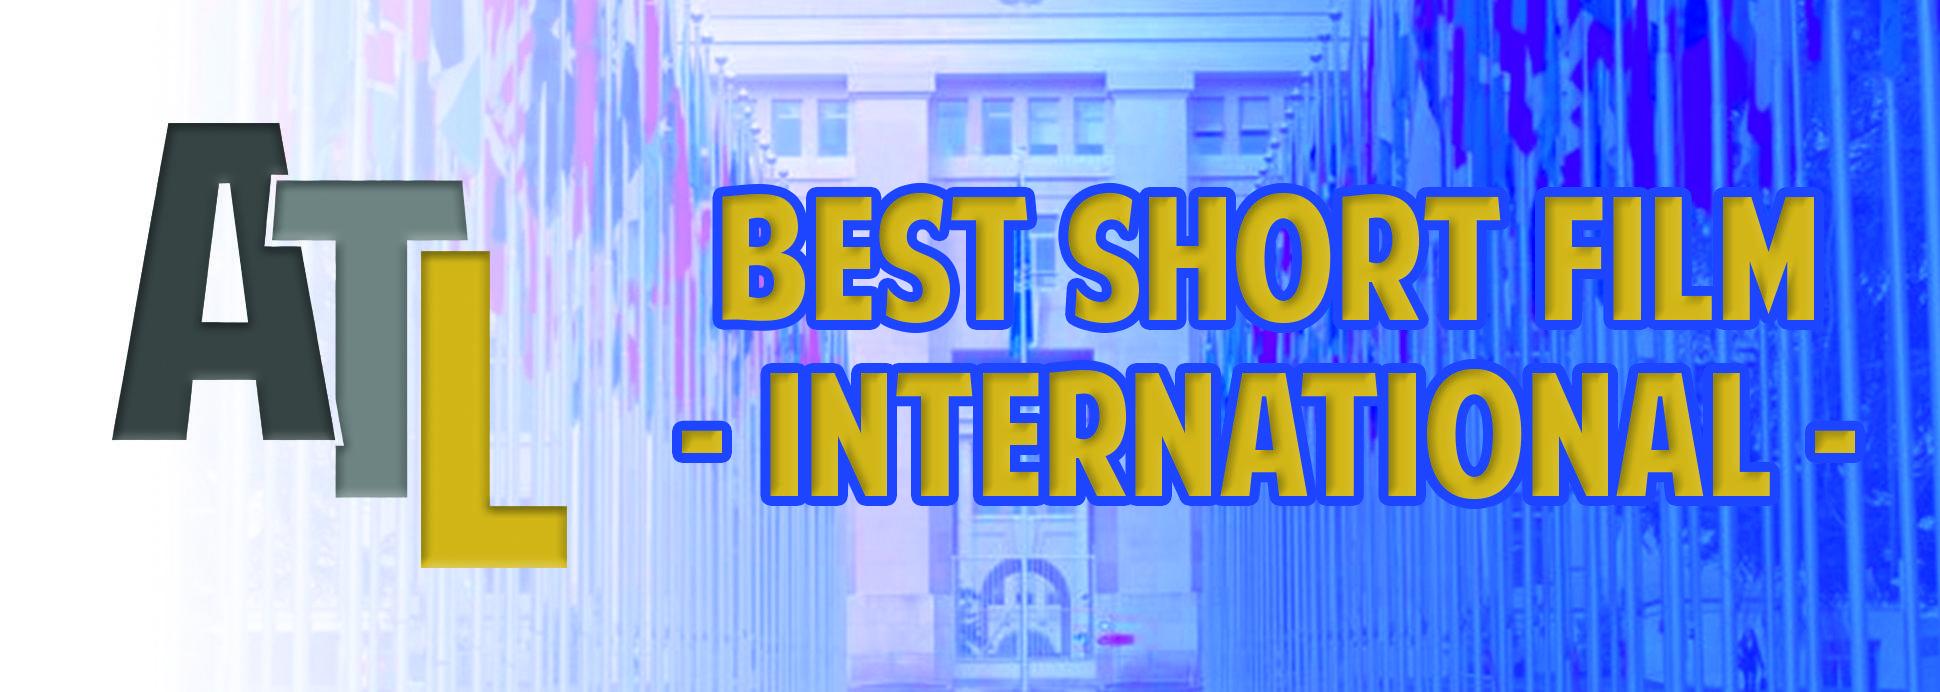 Best Short Film (International)